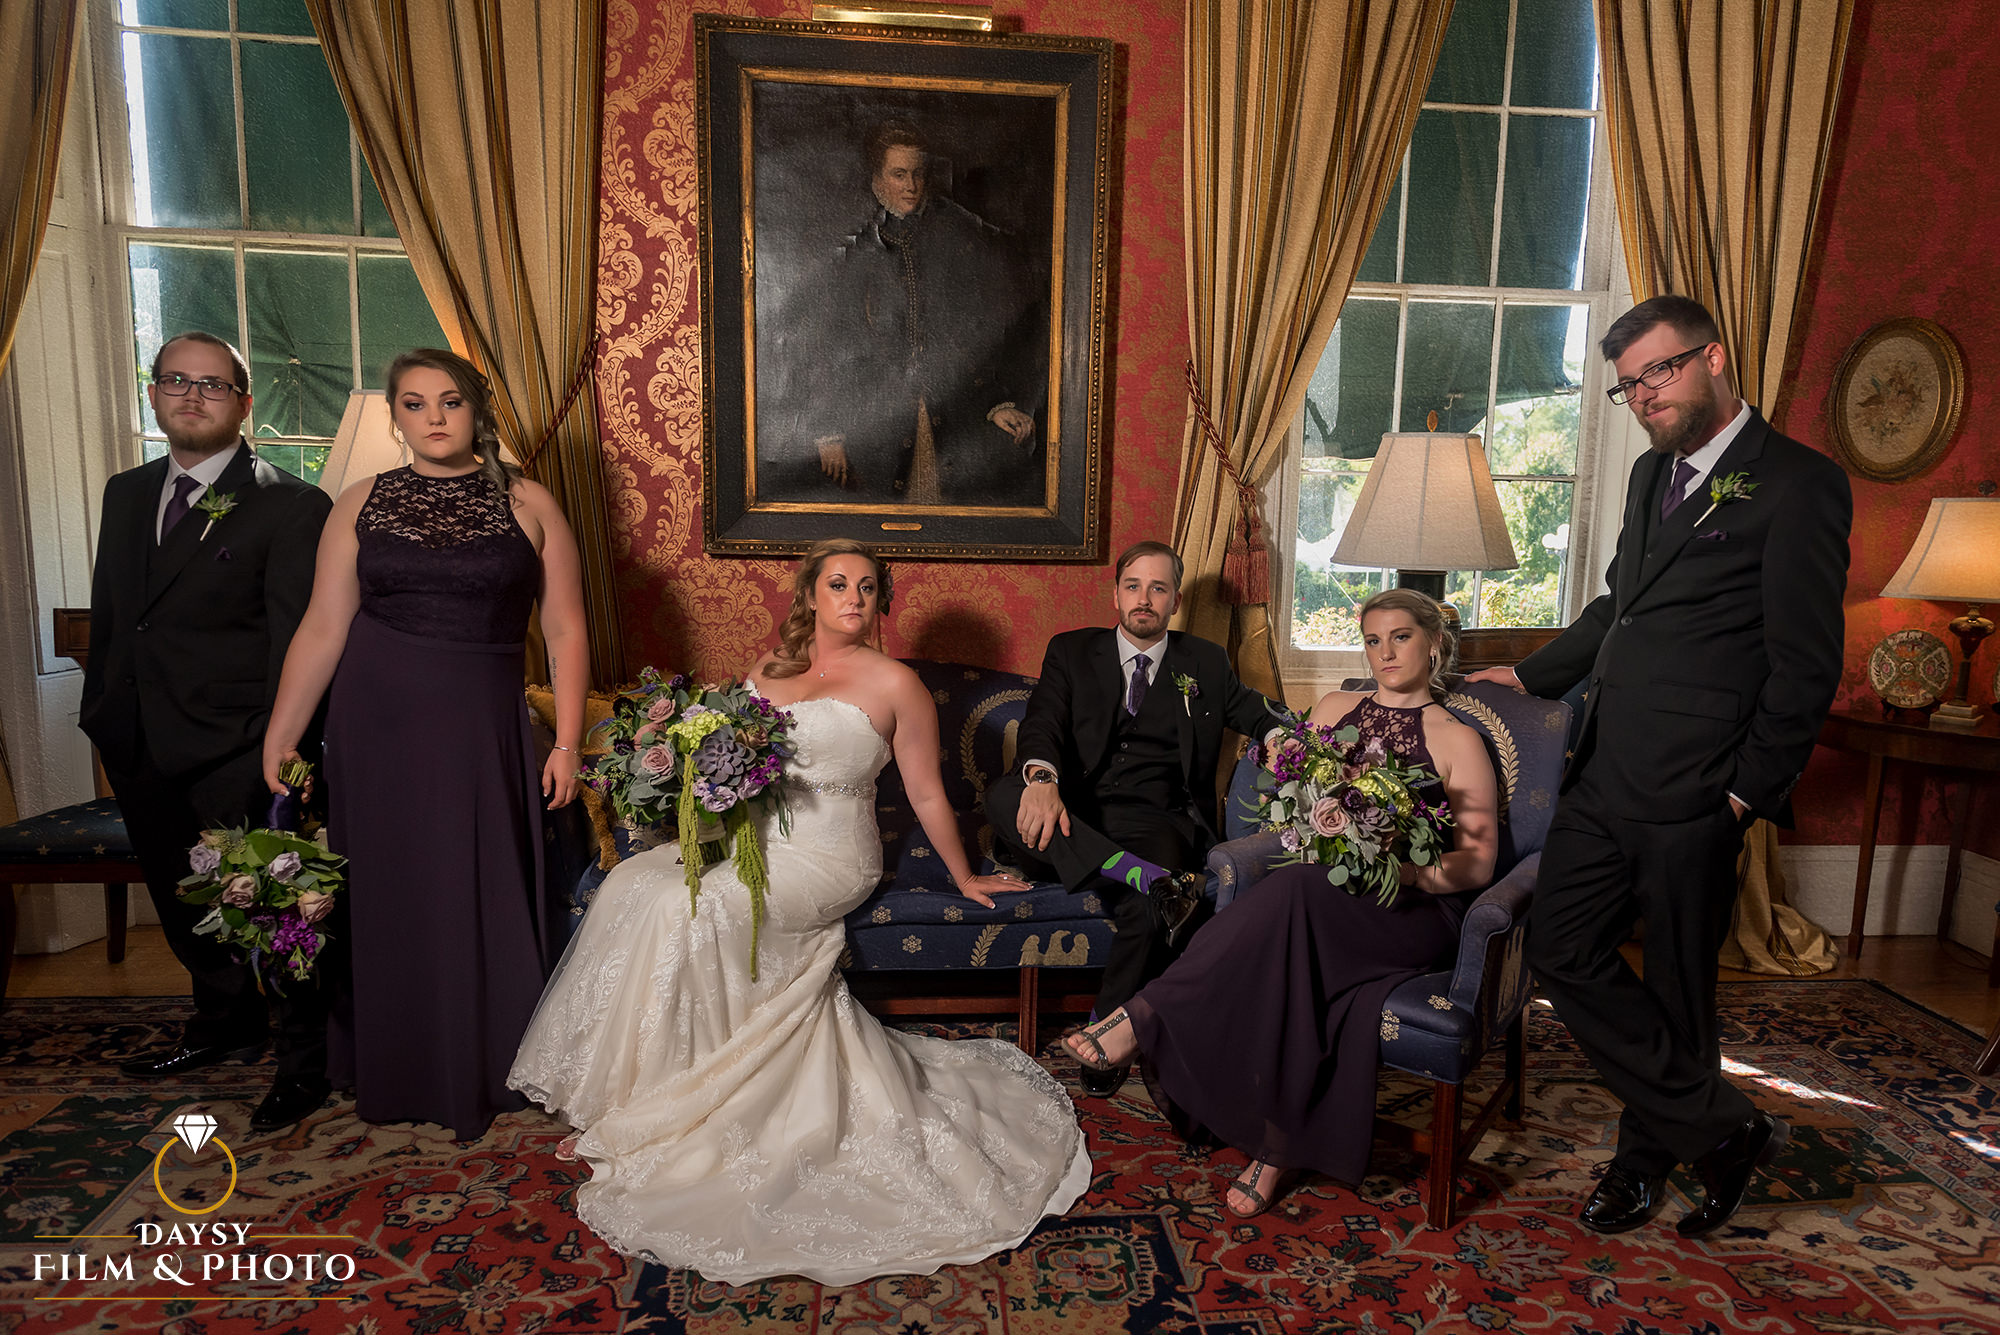 Antrim 1844 Inn wedding party photos inside hotel